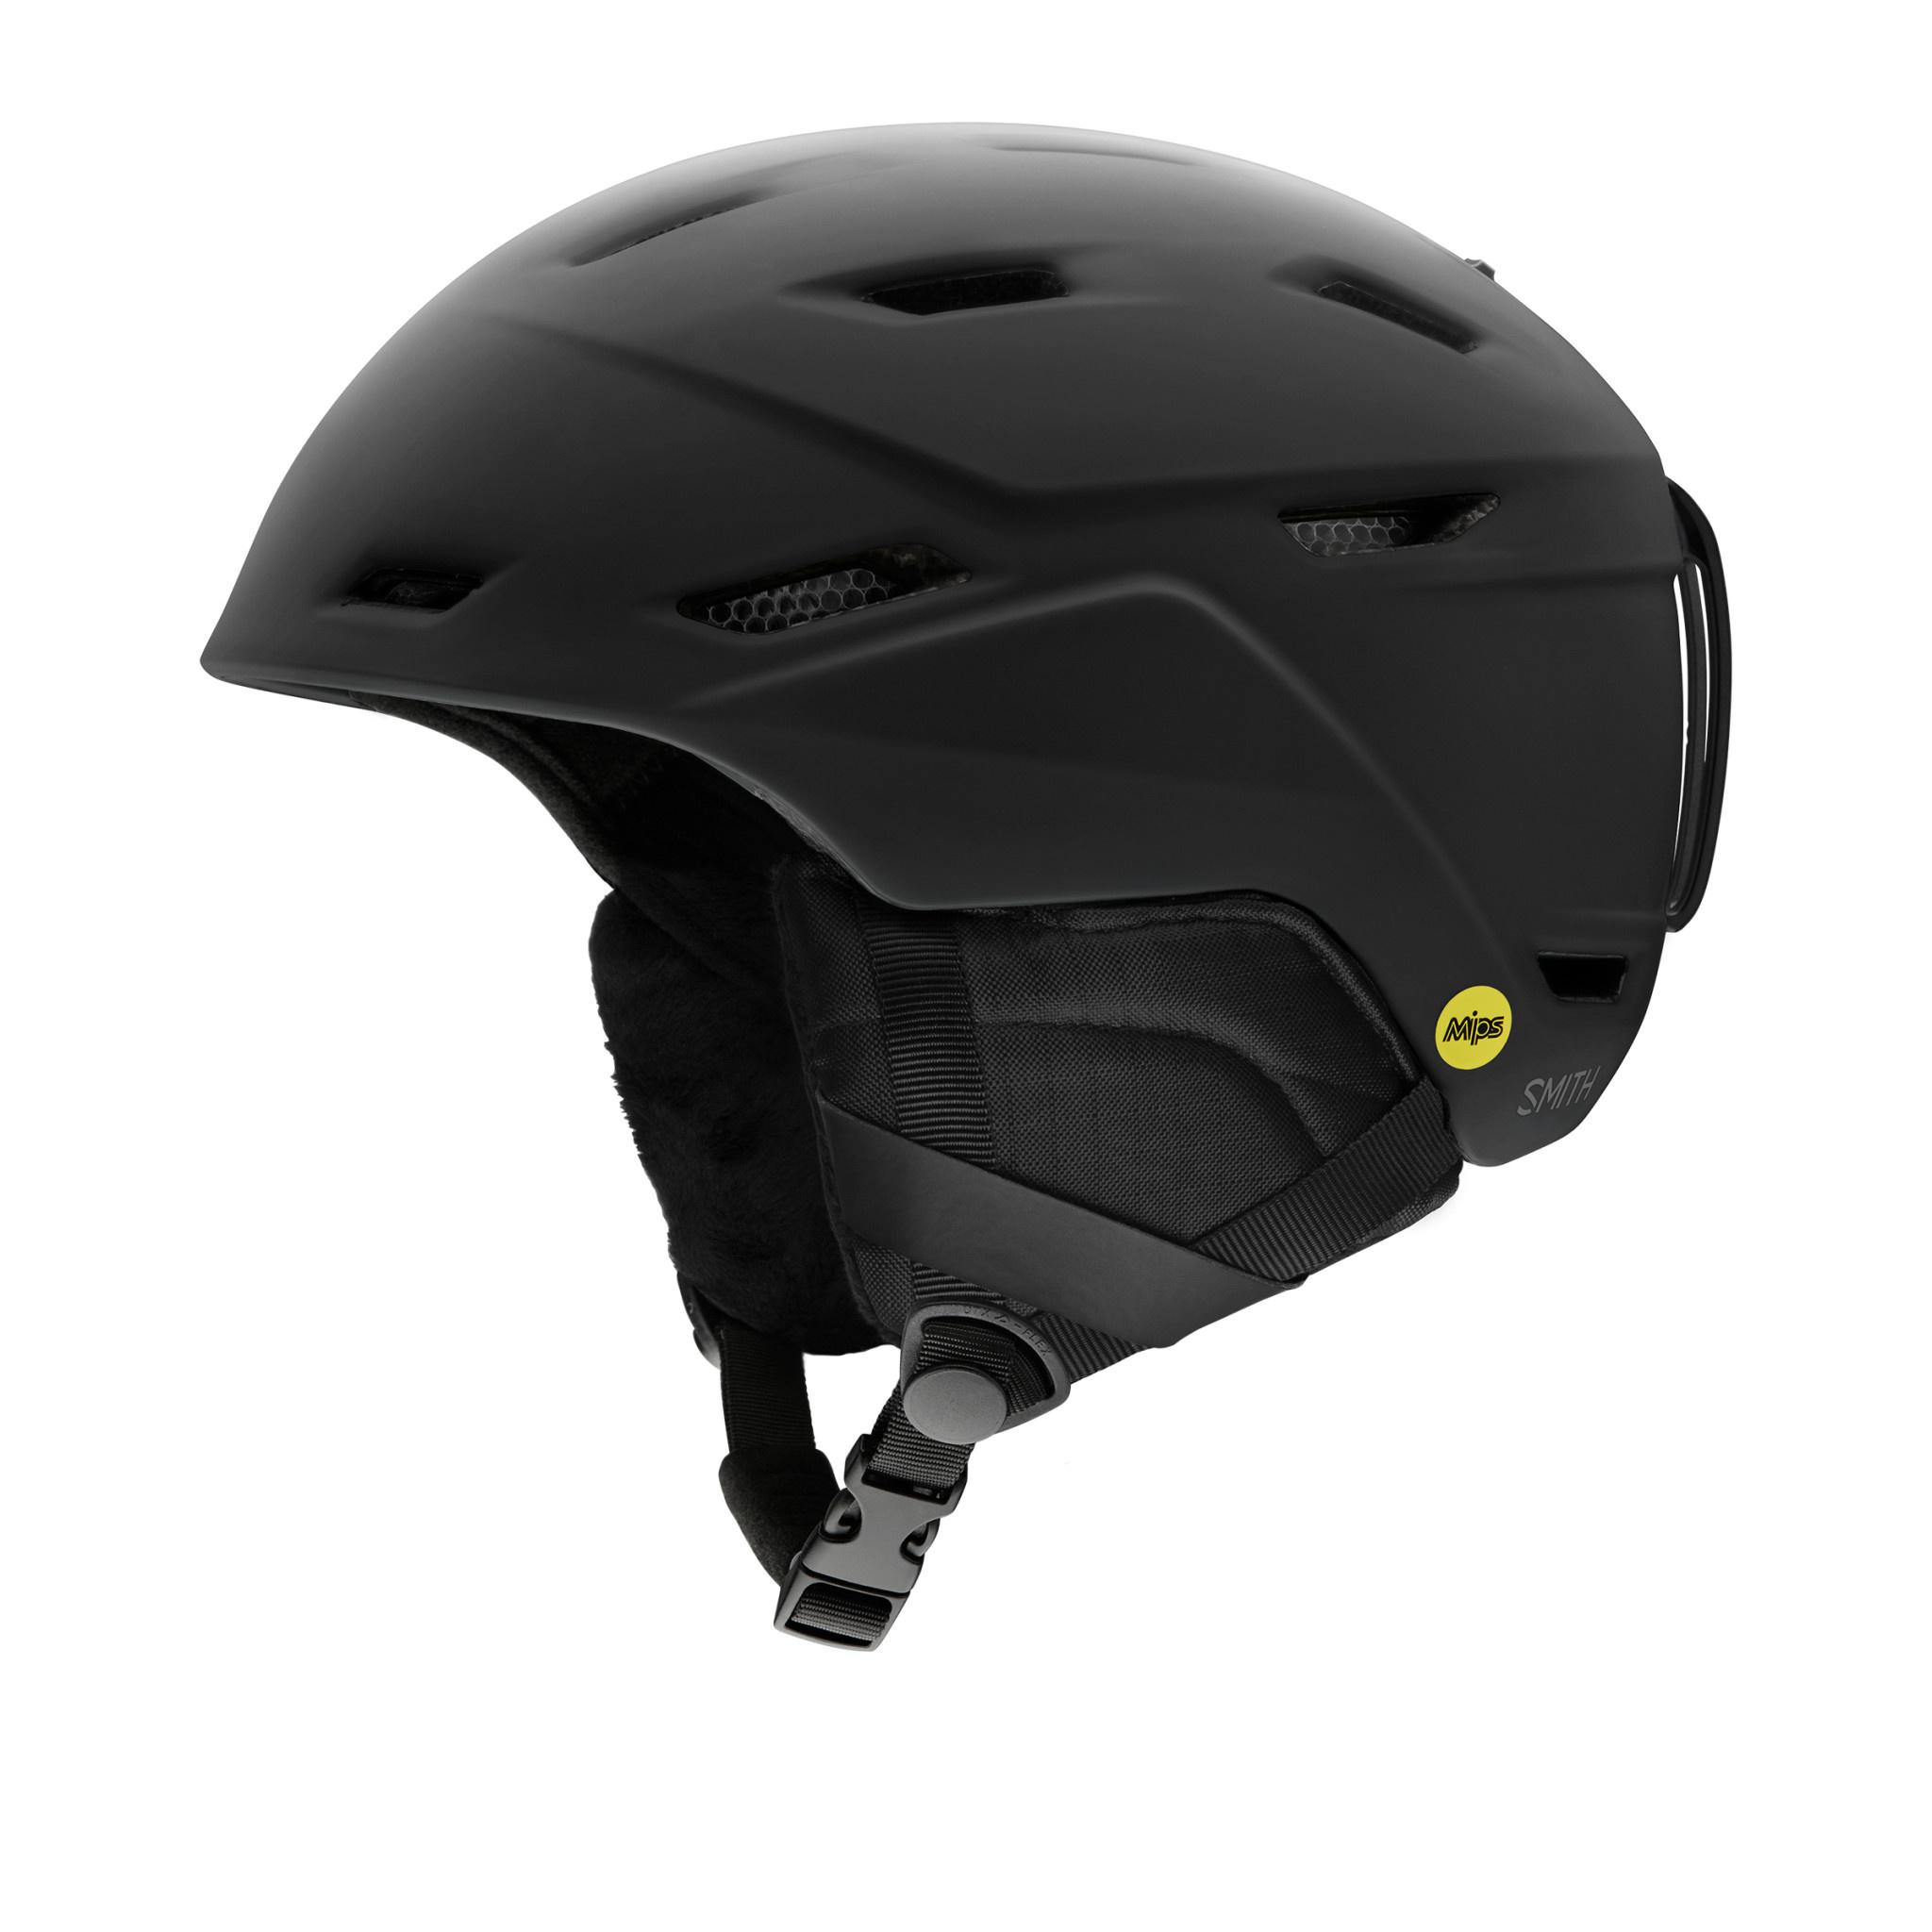 Smith Smith Youth Prospect Jr. MIPS Snow Helmet